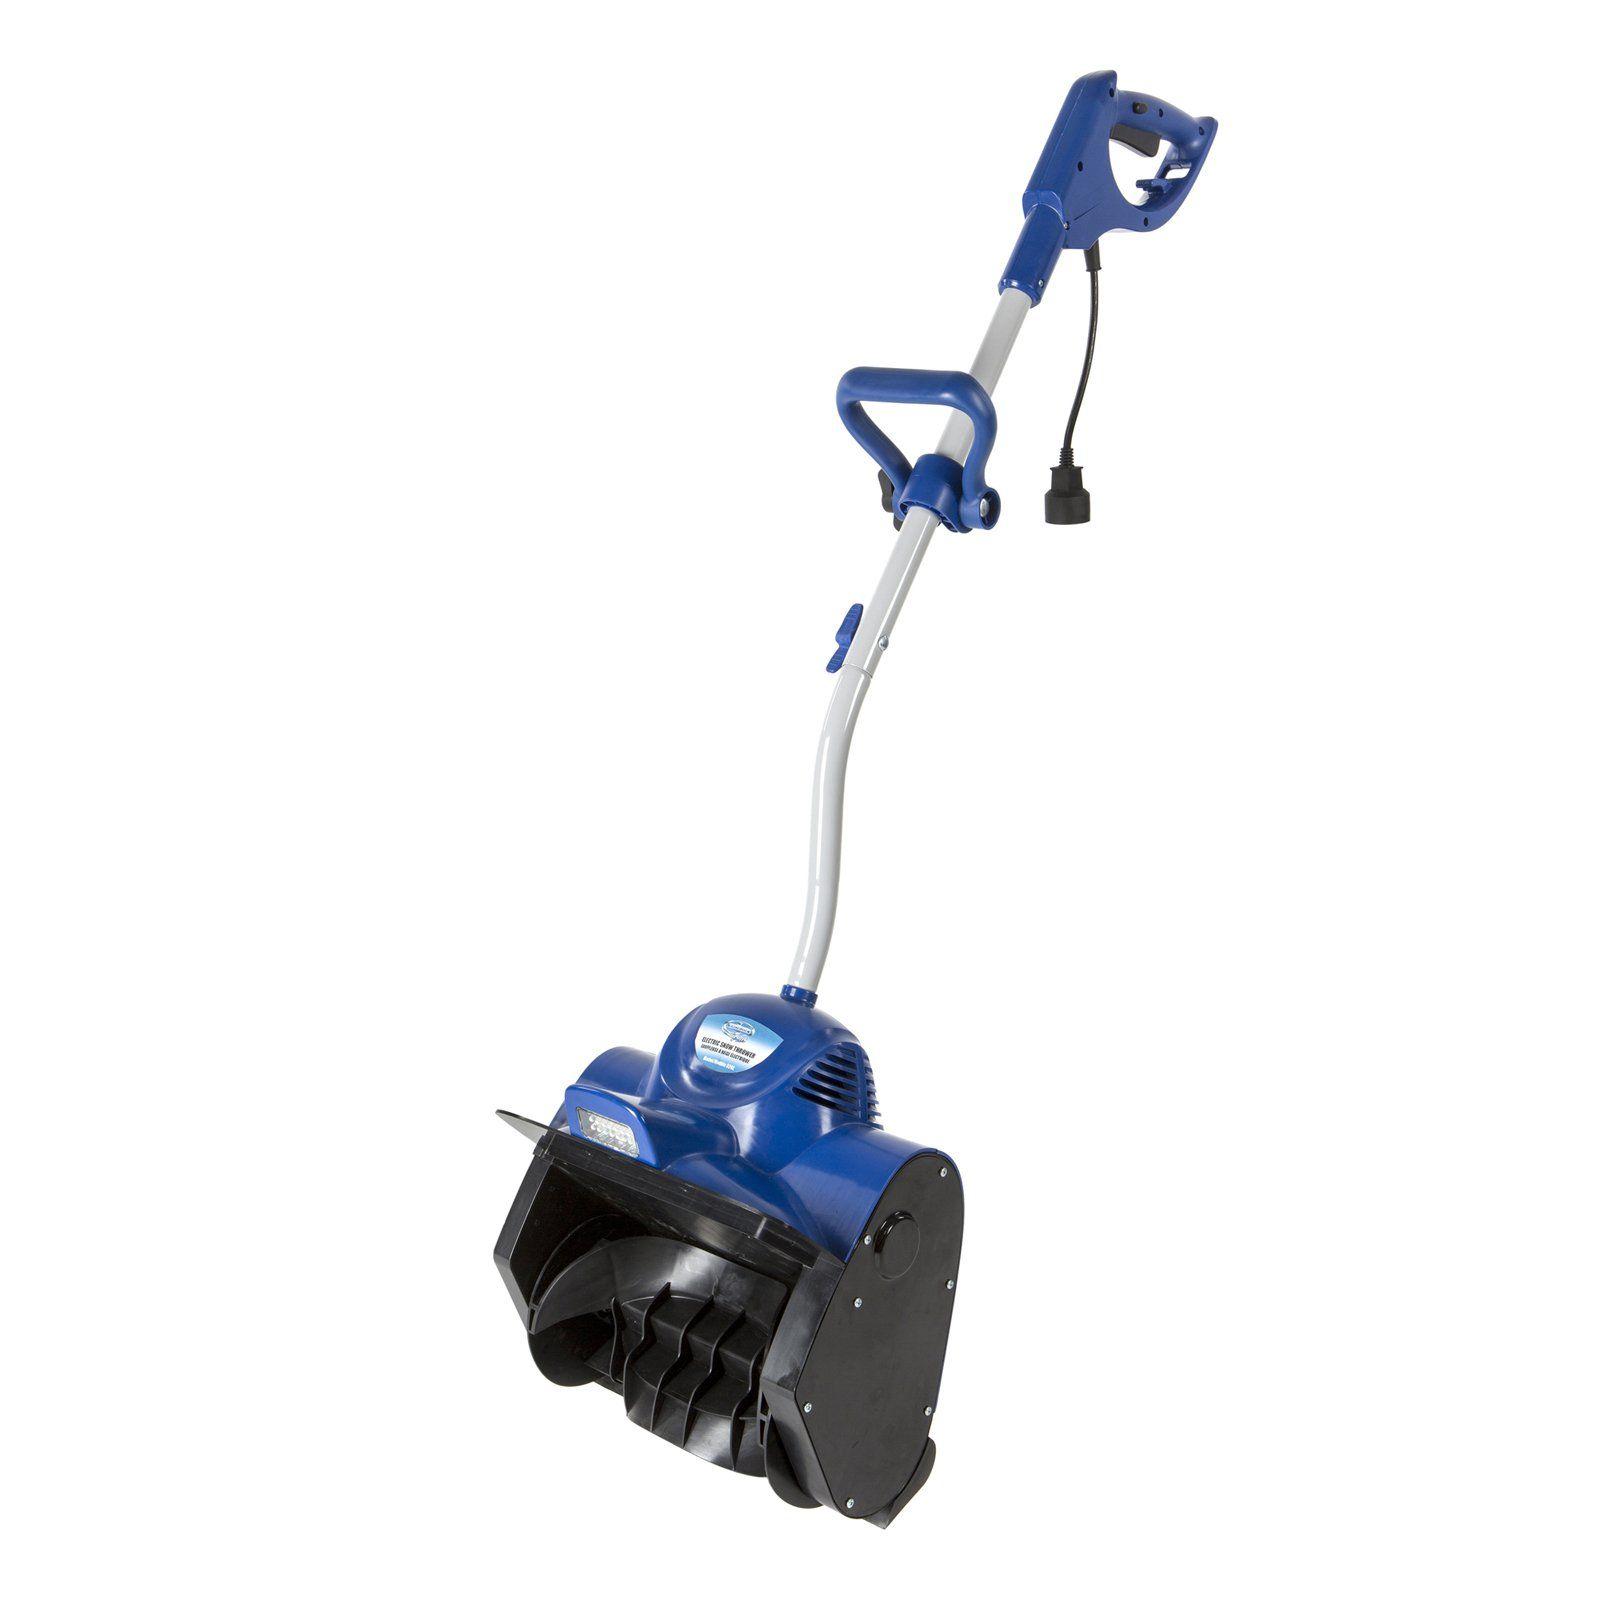 Recomeneded Yard Machines 784 5580 0637 Snow Blower Slide Shoe Skid Electric Snow Blower Electric Snow Shovel Snow Blower